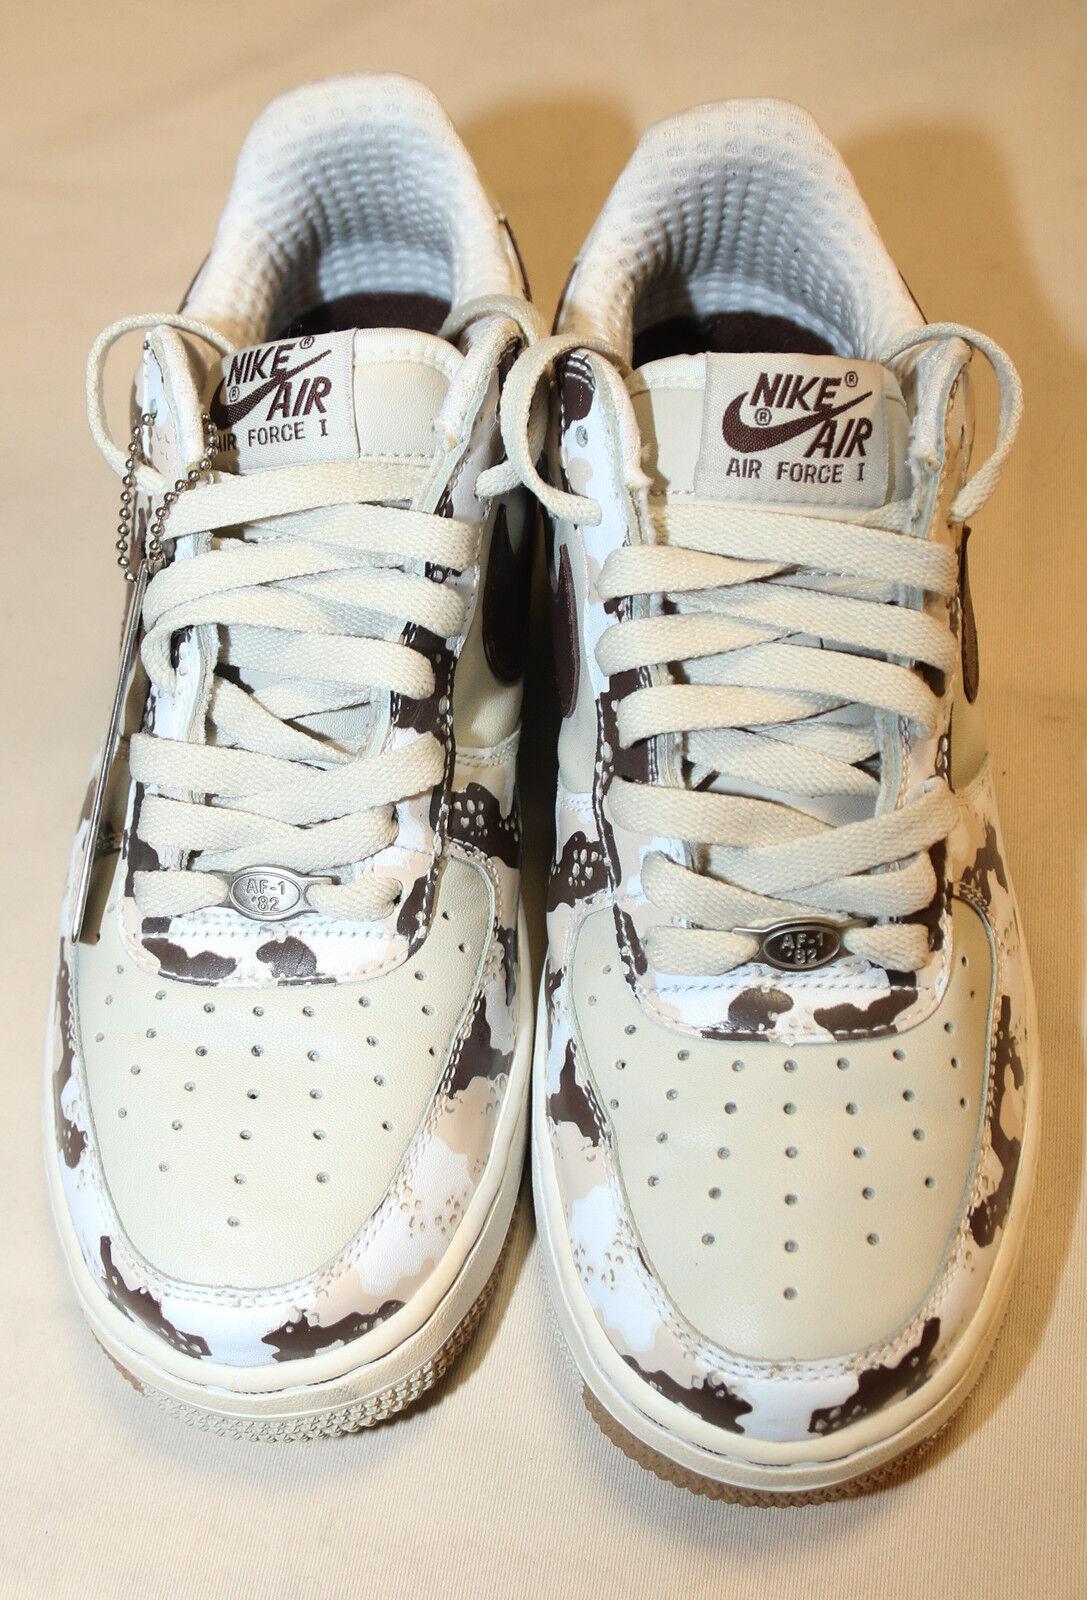 Nike Air Force 1 Premium AF-1 82 Low Men's Shoes Sneakers Sz. 8 New